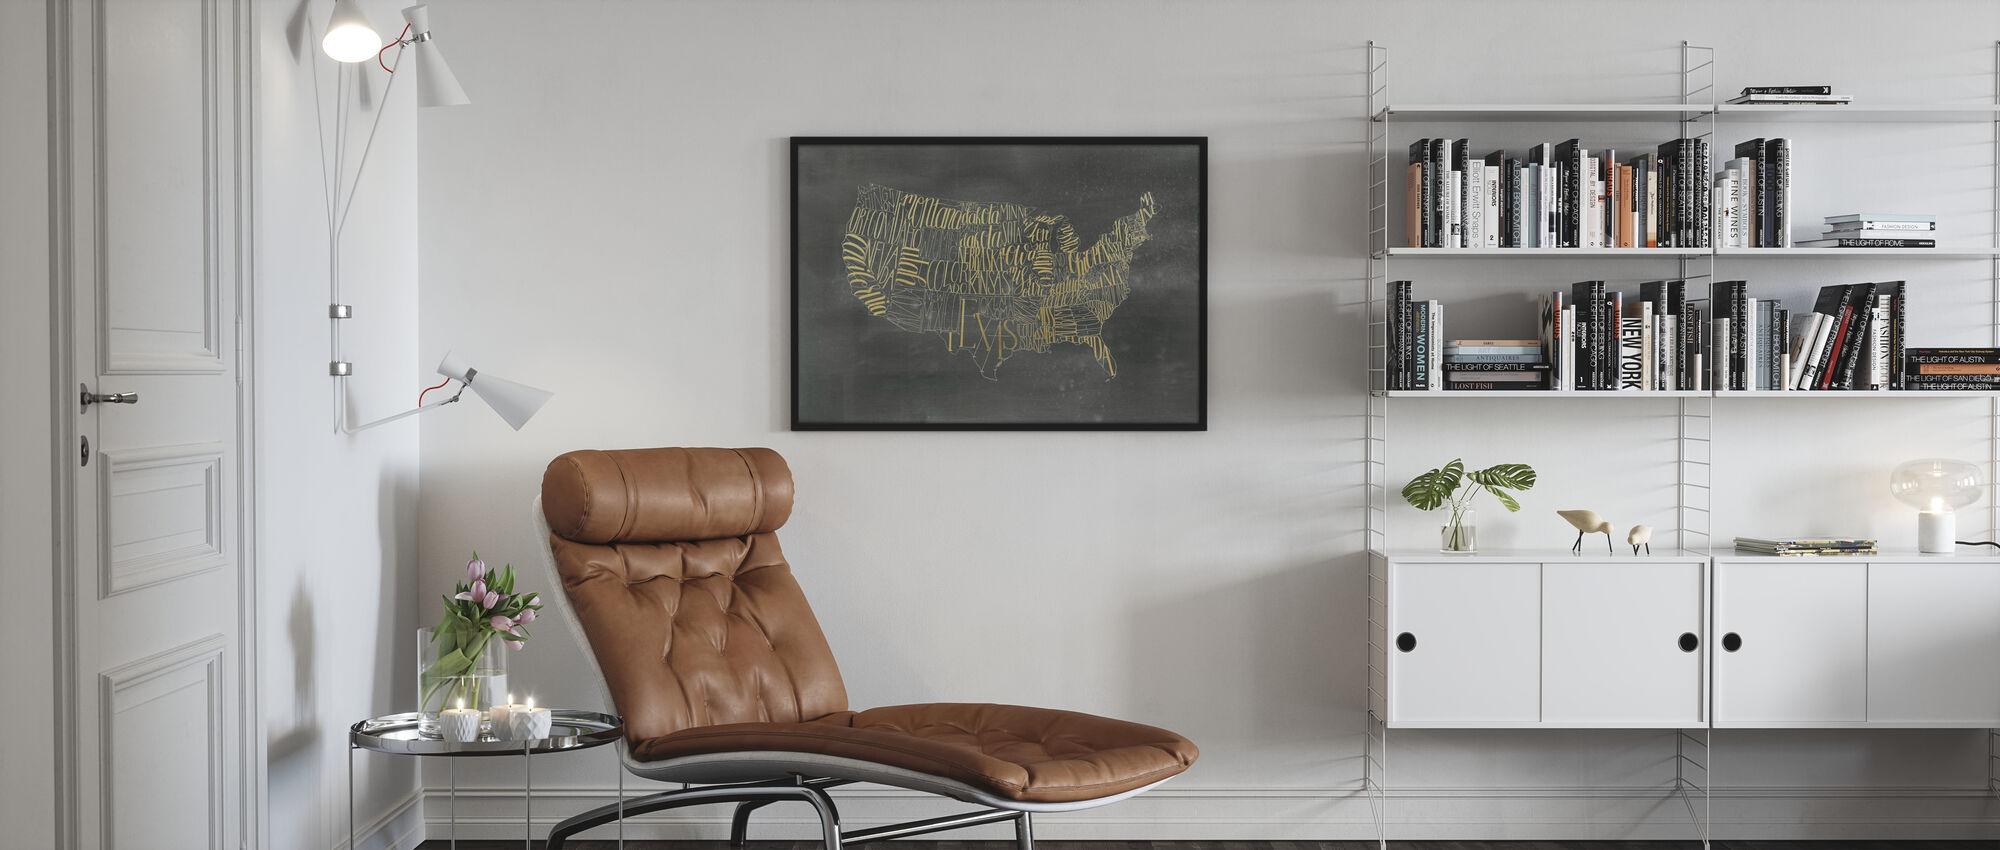 USA Map on Black Wash - Poster - Living Room